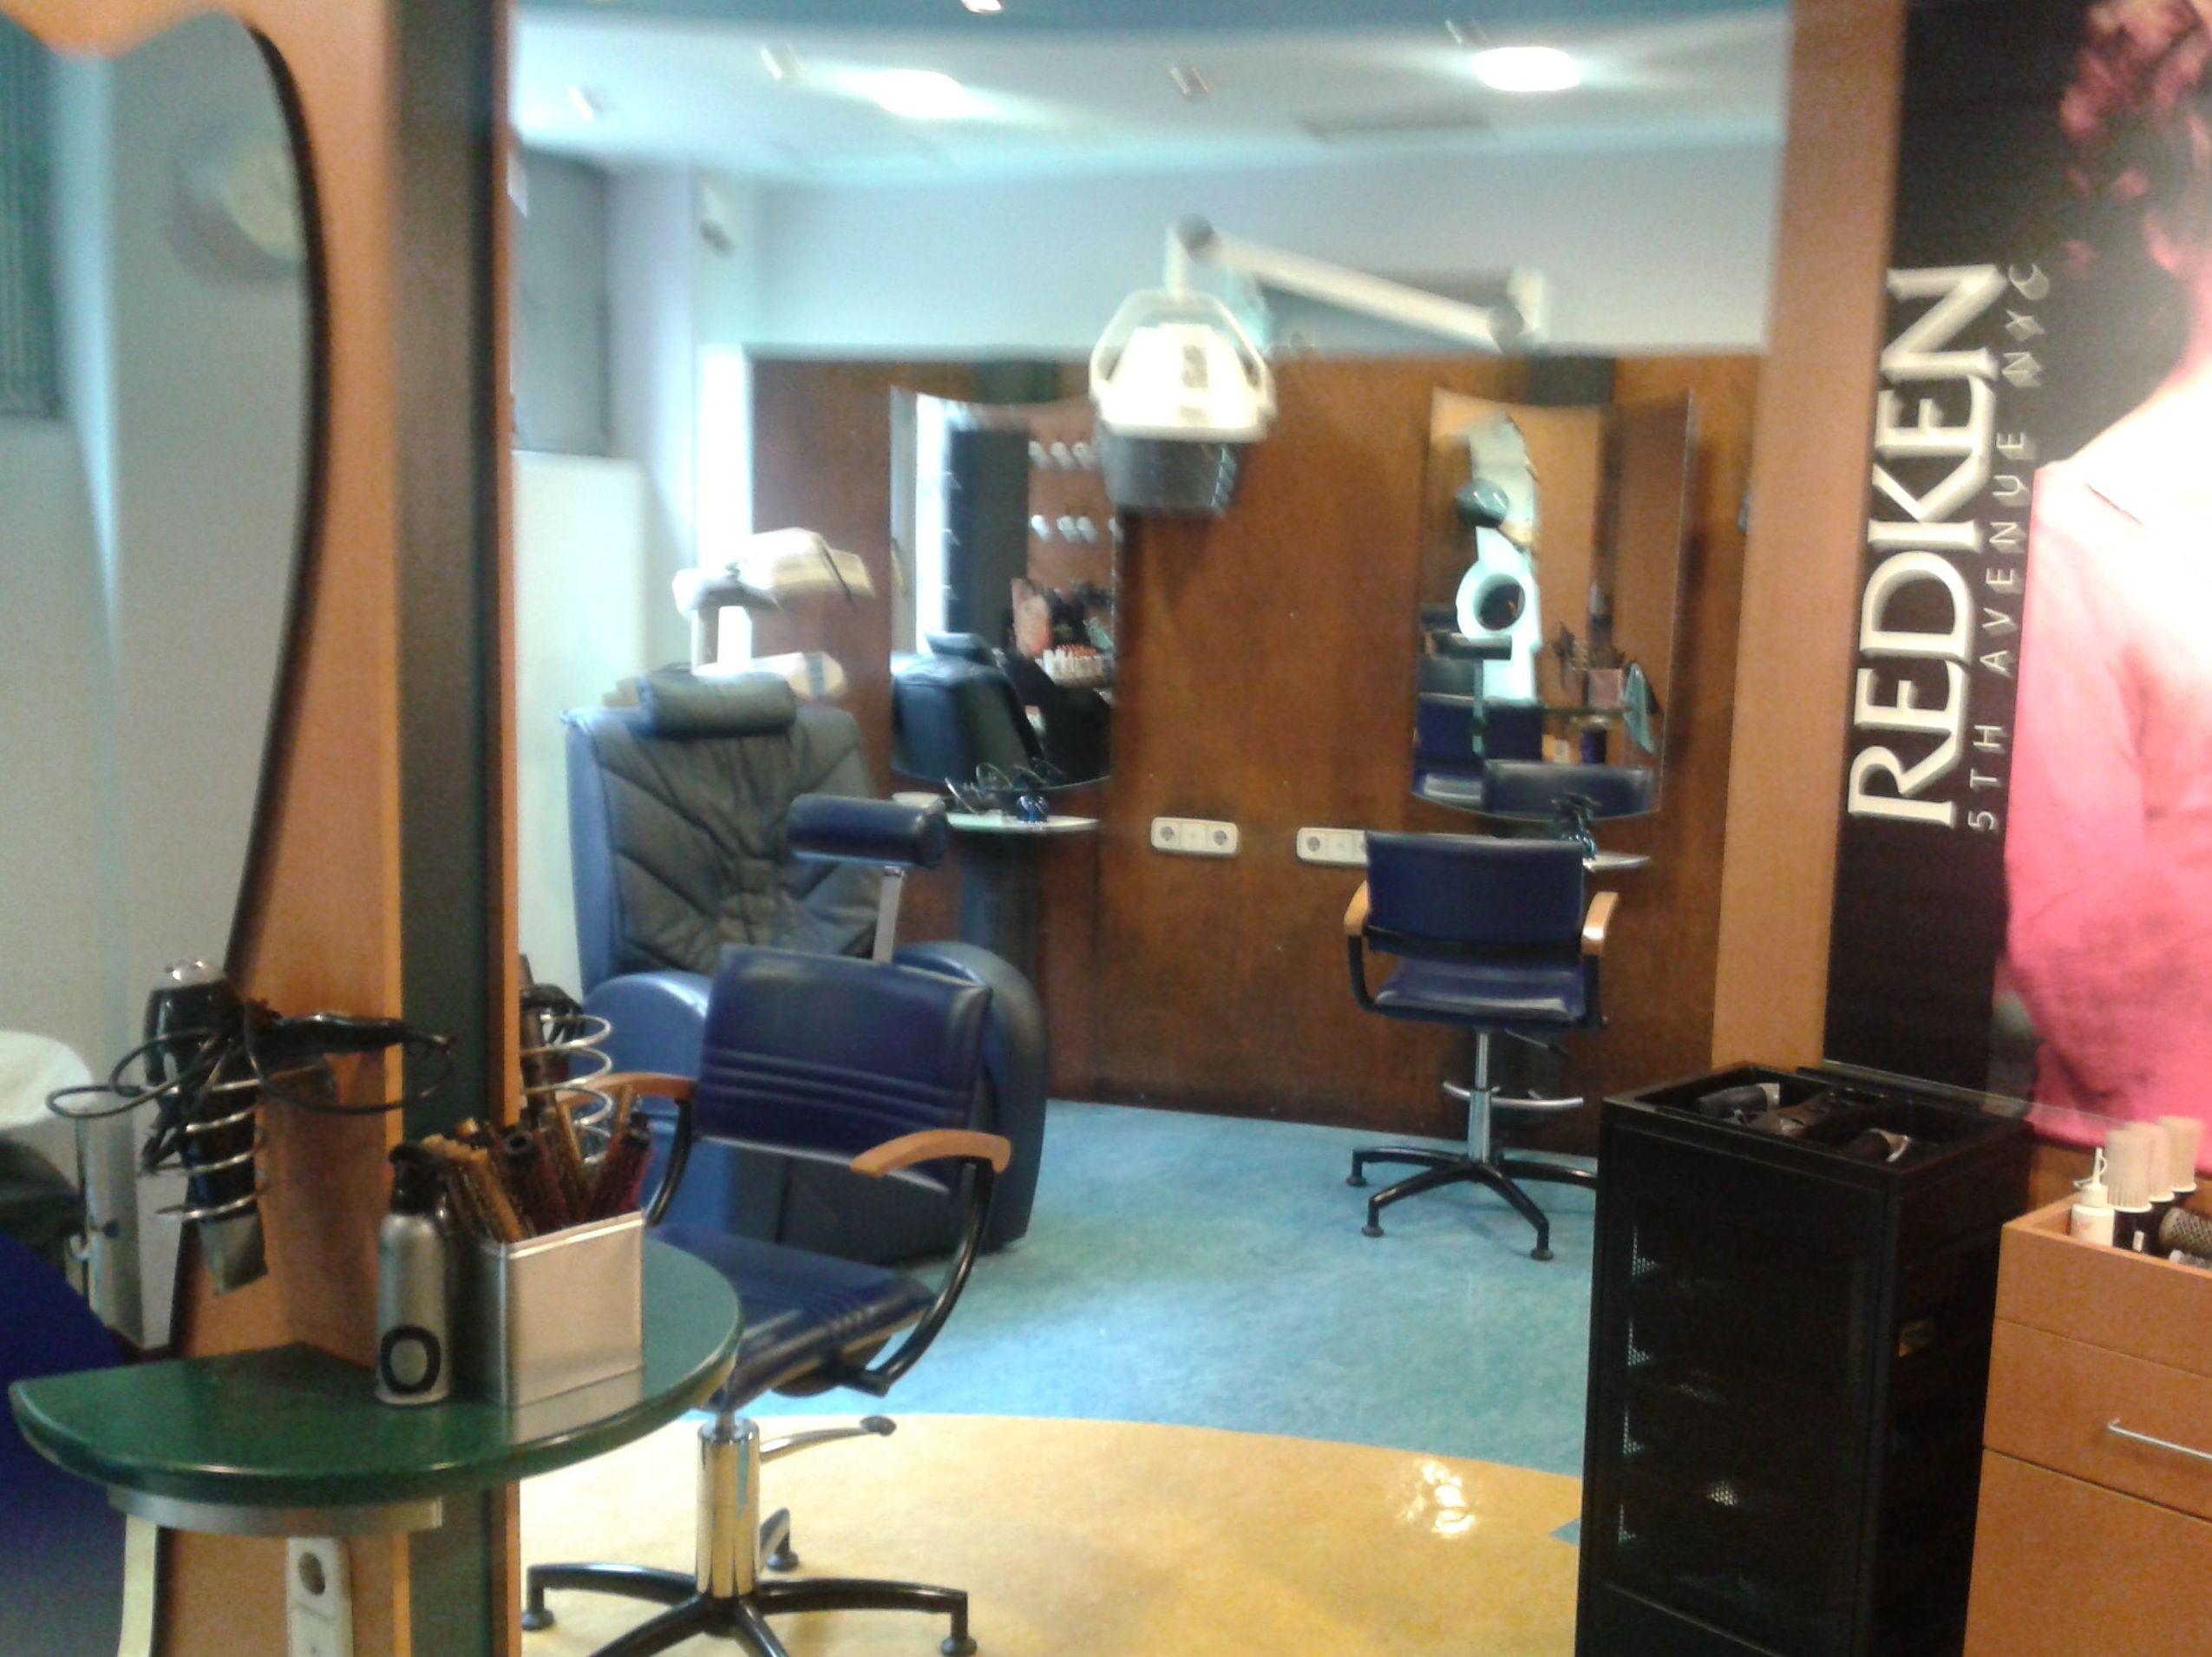 Salon de peluqueria unisex en Bilbao